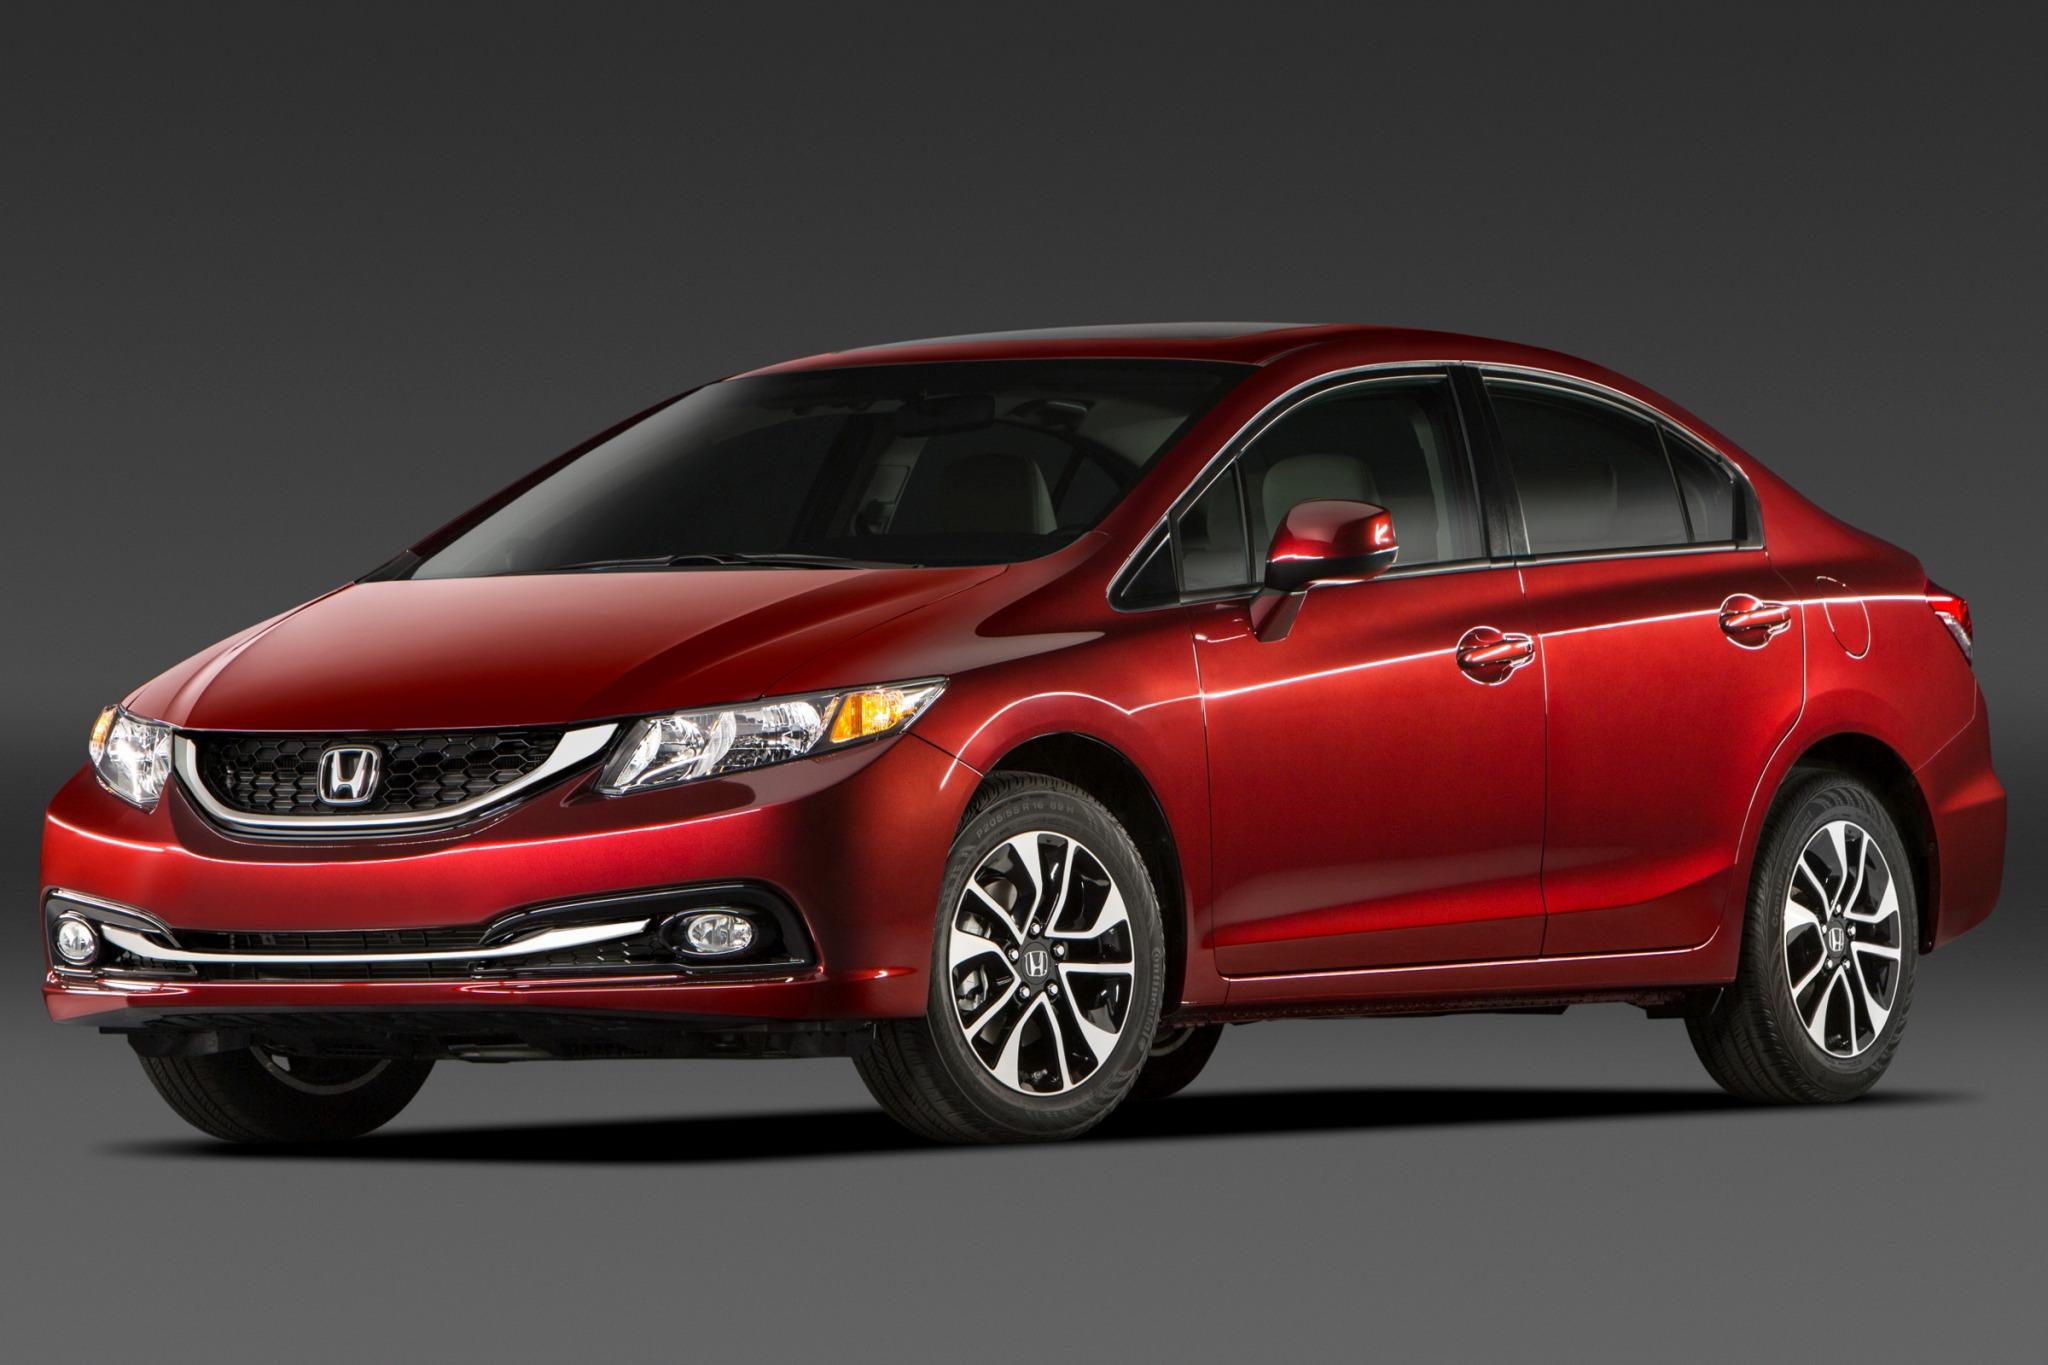 2013 Honda Civic - Information and photos - ZombieDrive